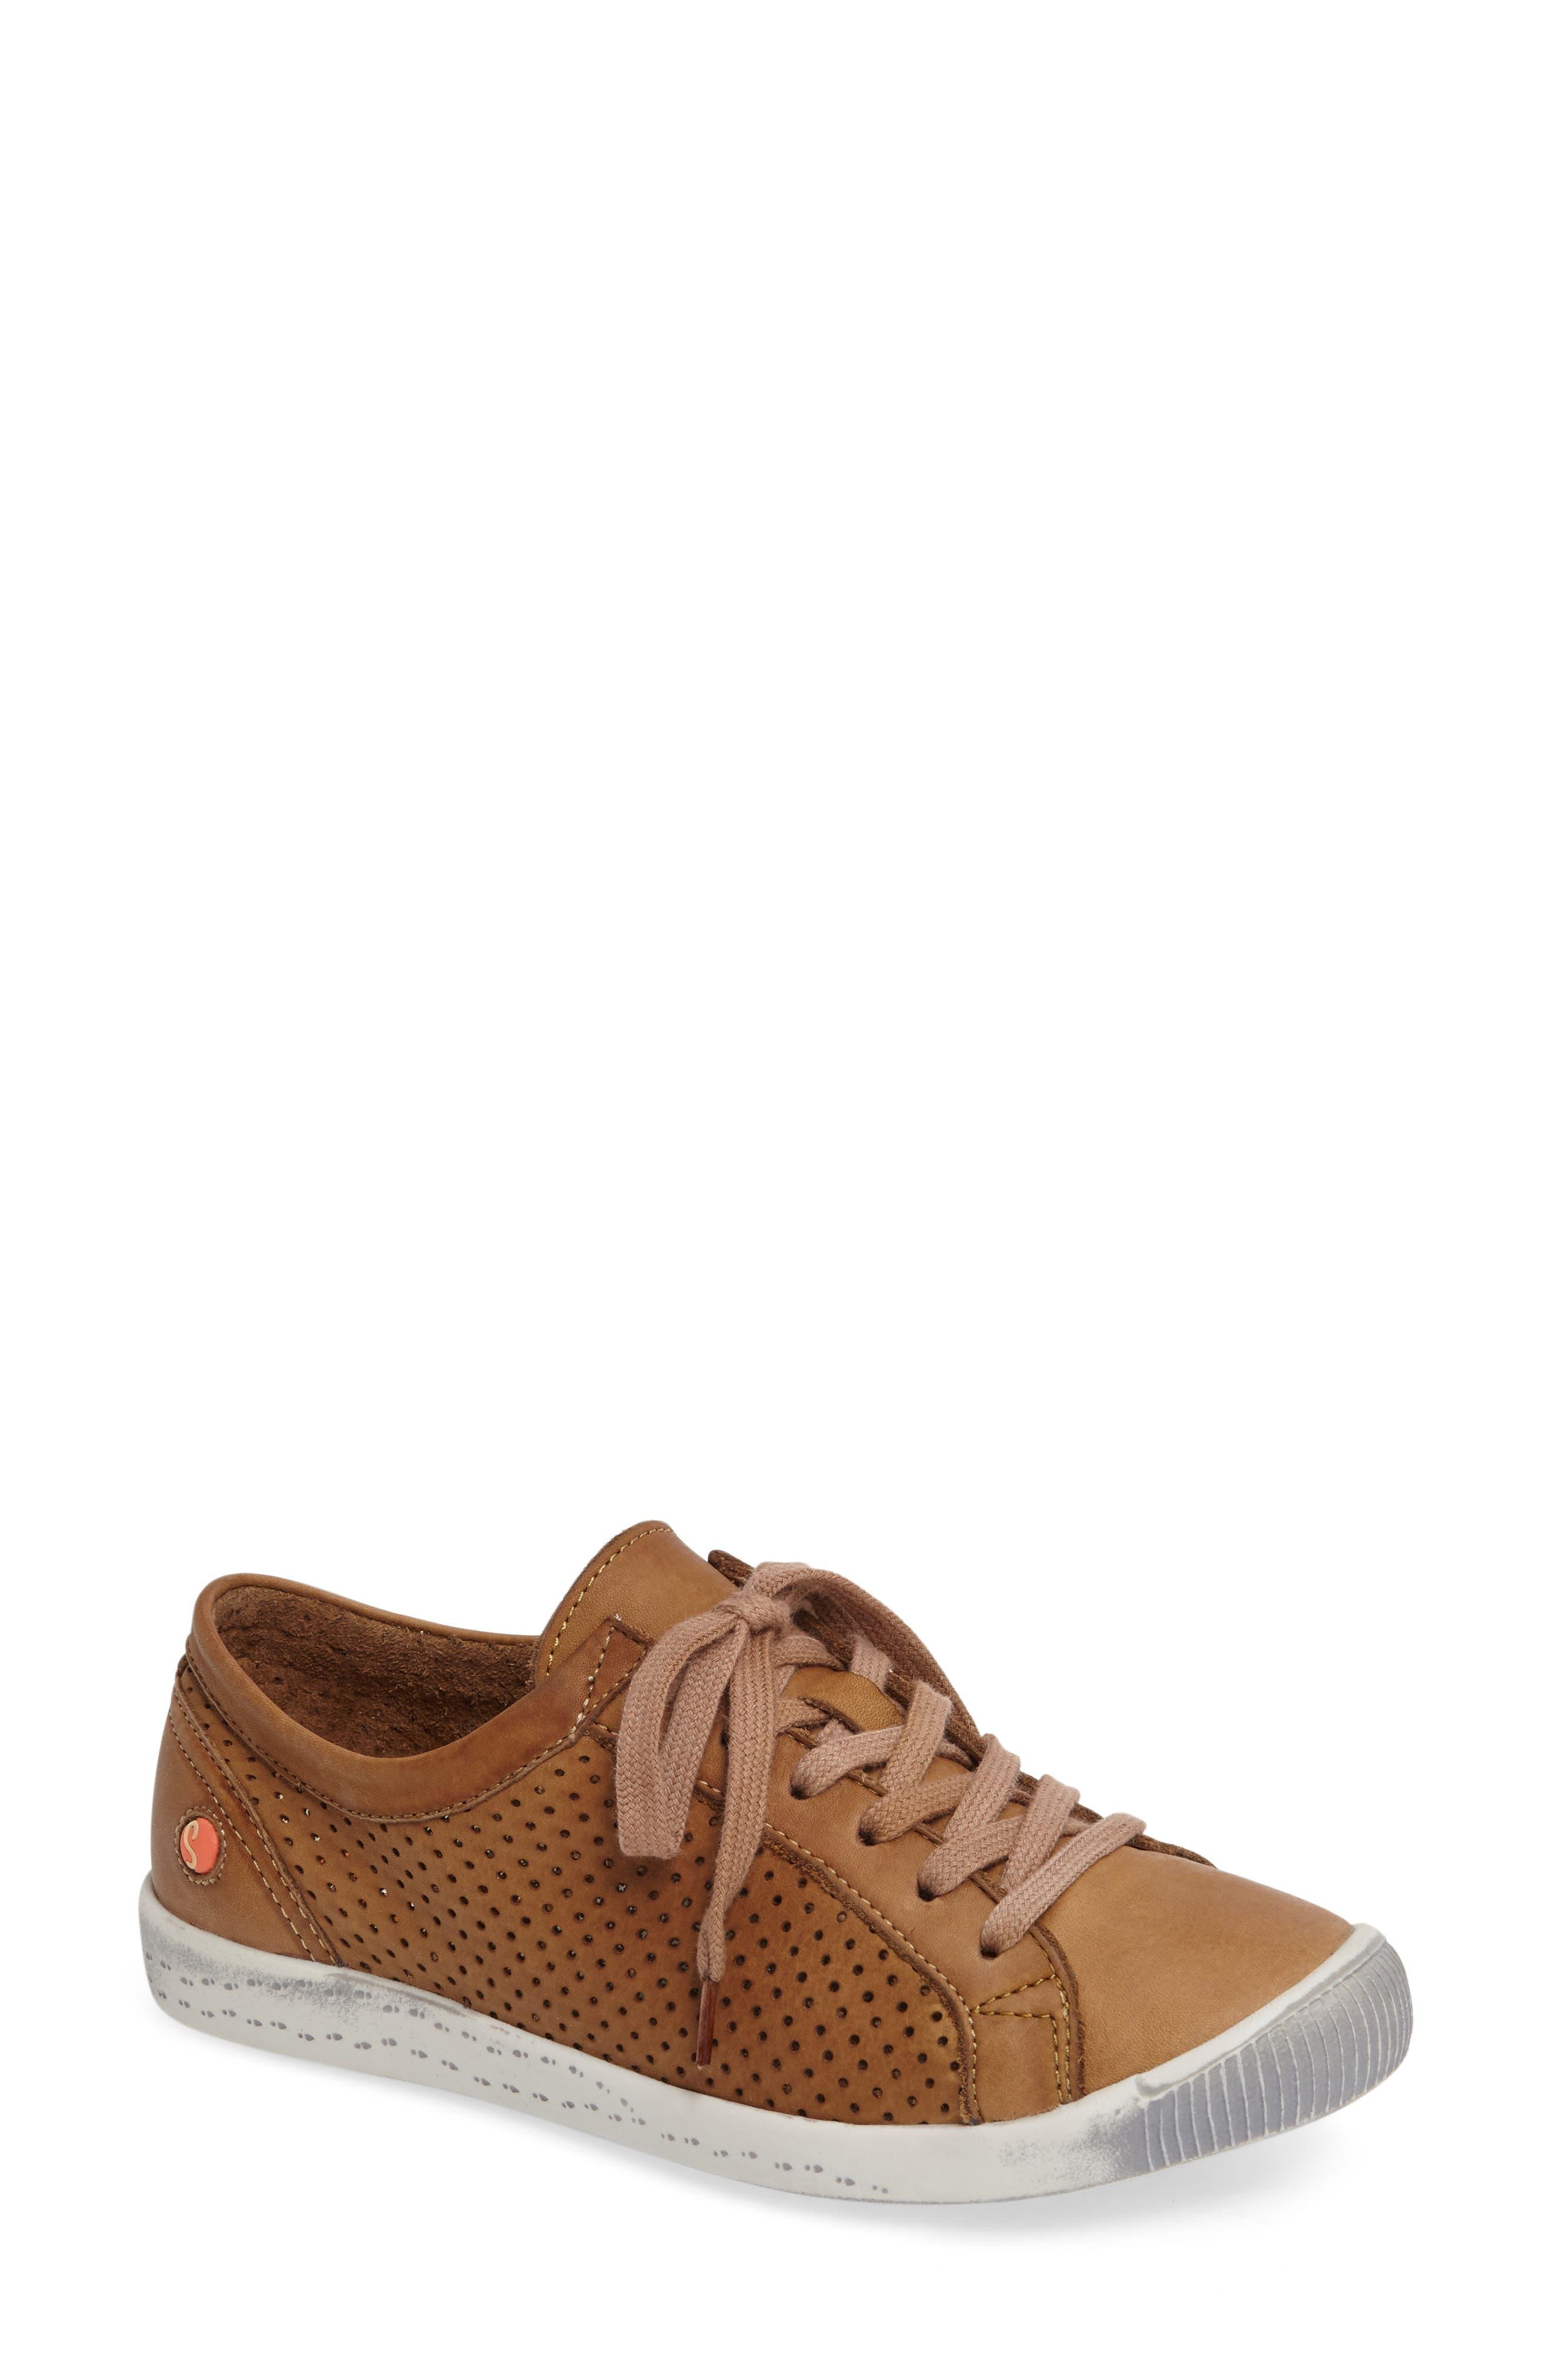 Ica Sneaker,                             Main thumbnail 6, color,